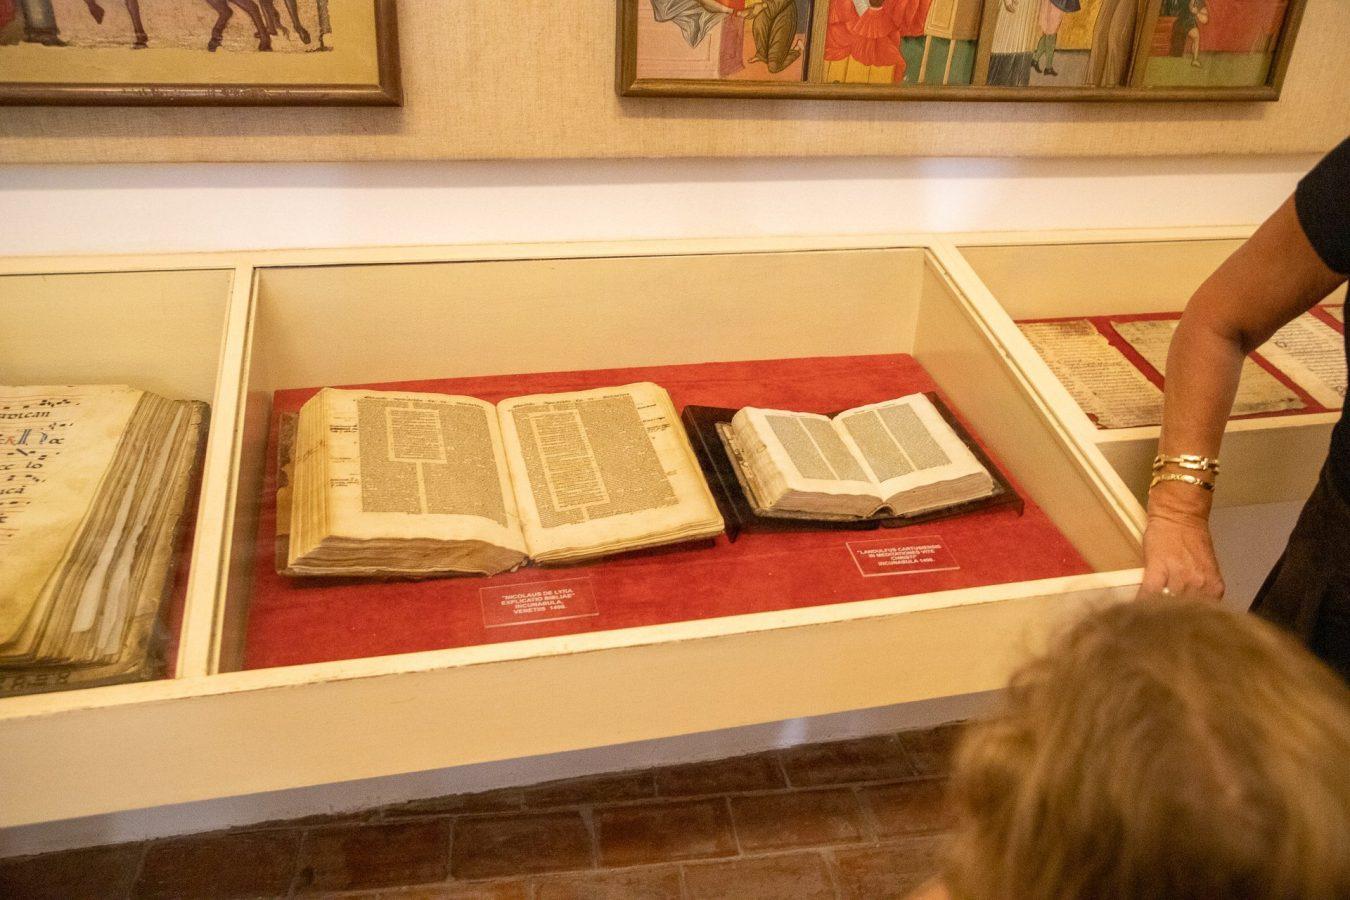 Some handwritten books on display